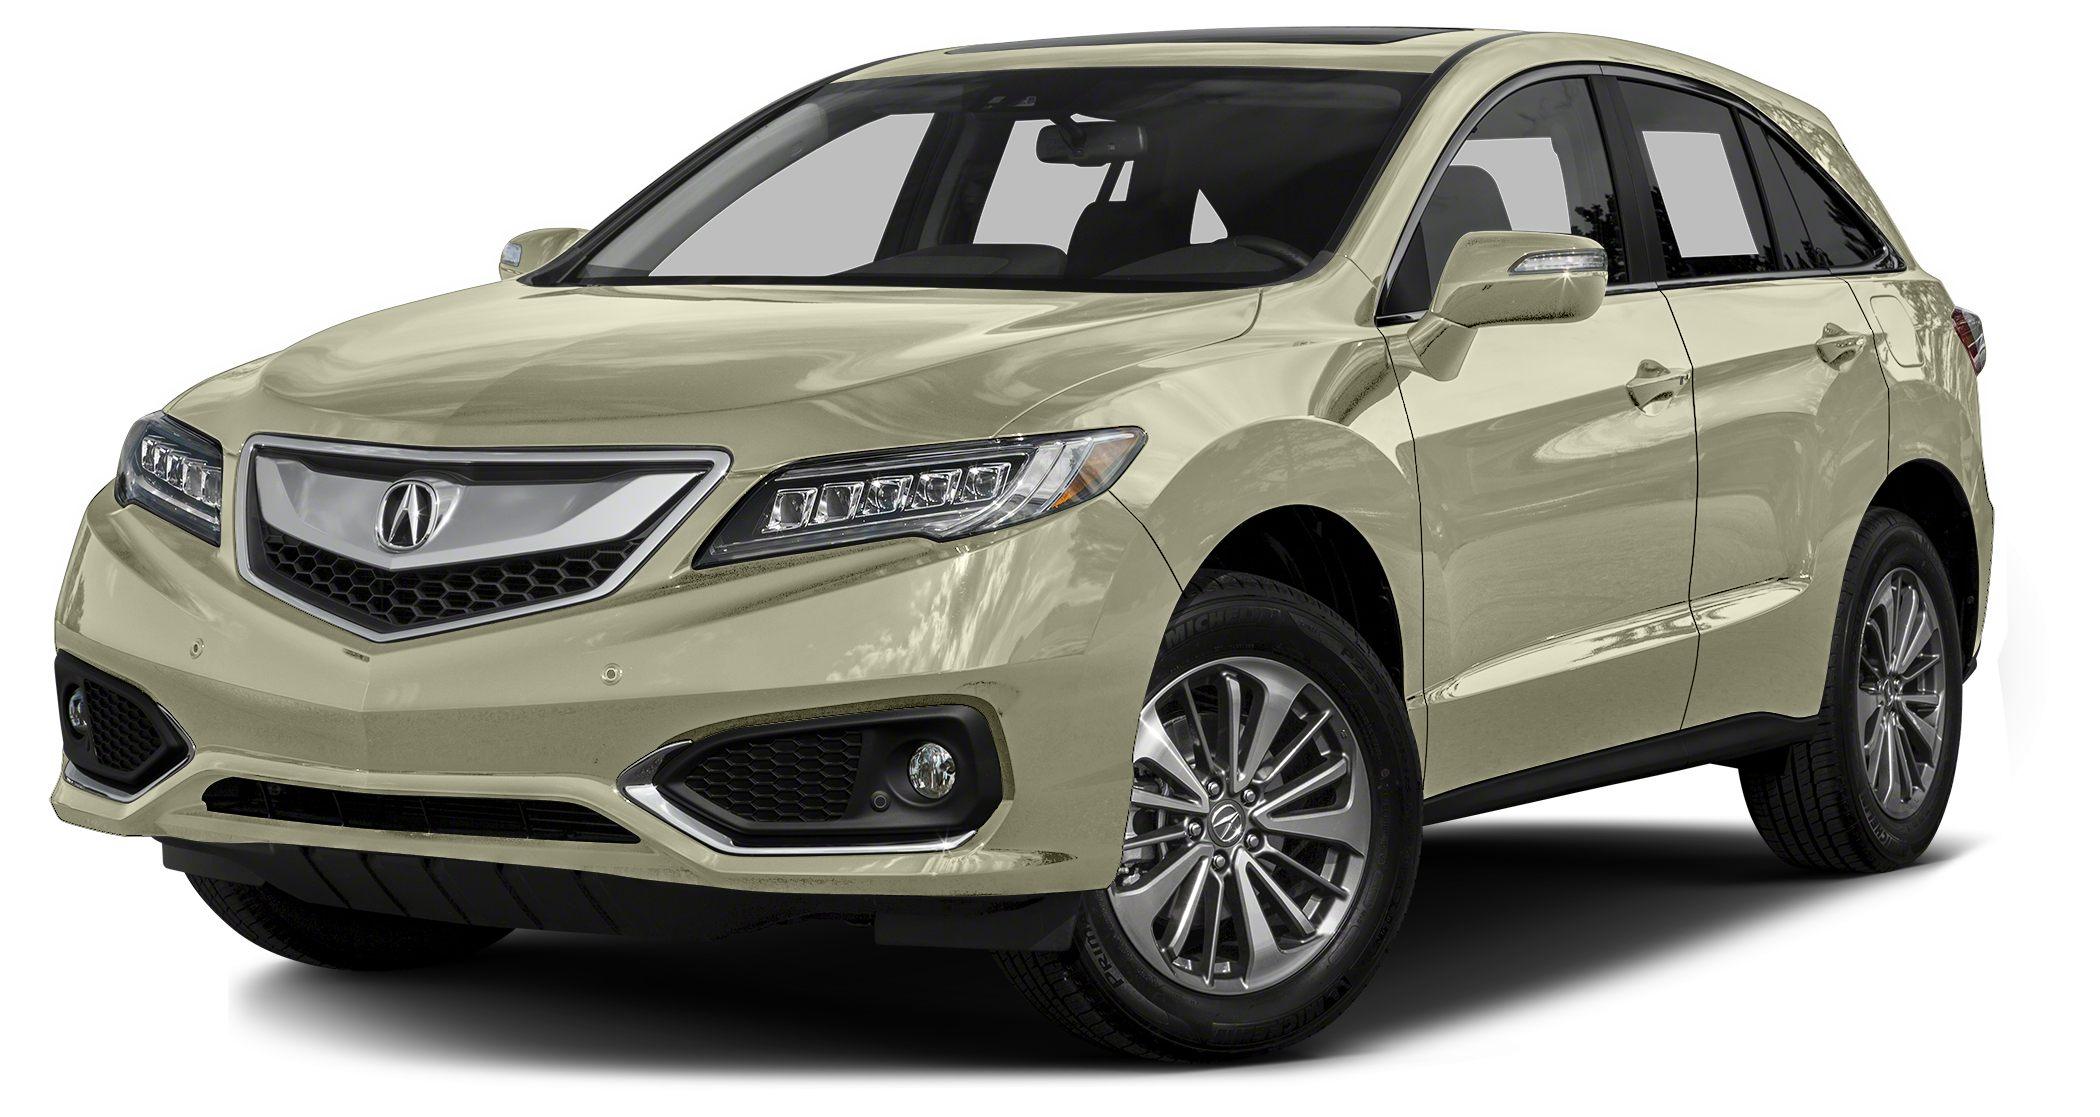 2016 Acura RDX Advance Miles 2Color White Diamond Pearl Stock A009354 VIN 5J8TB4H79GL009354